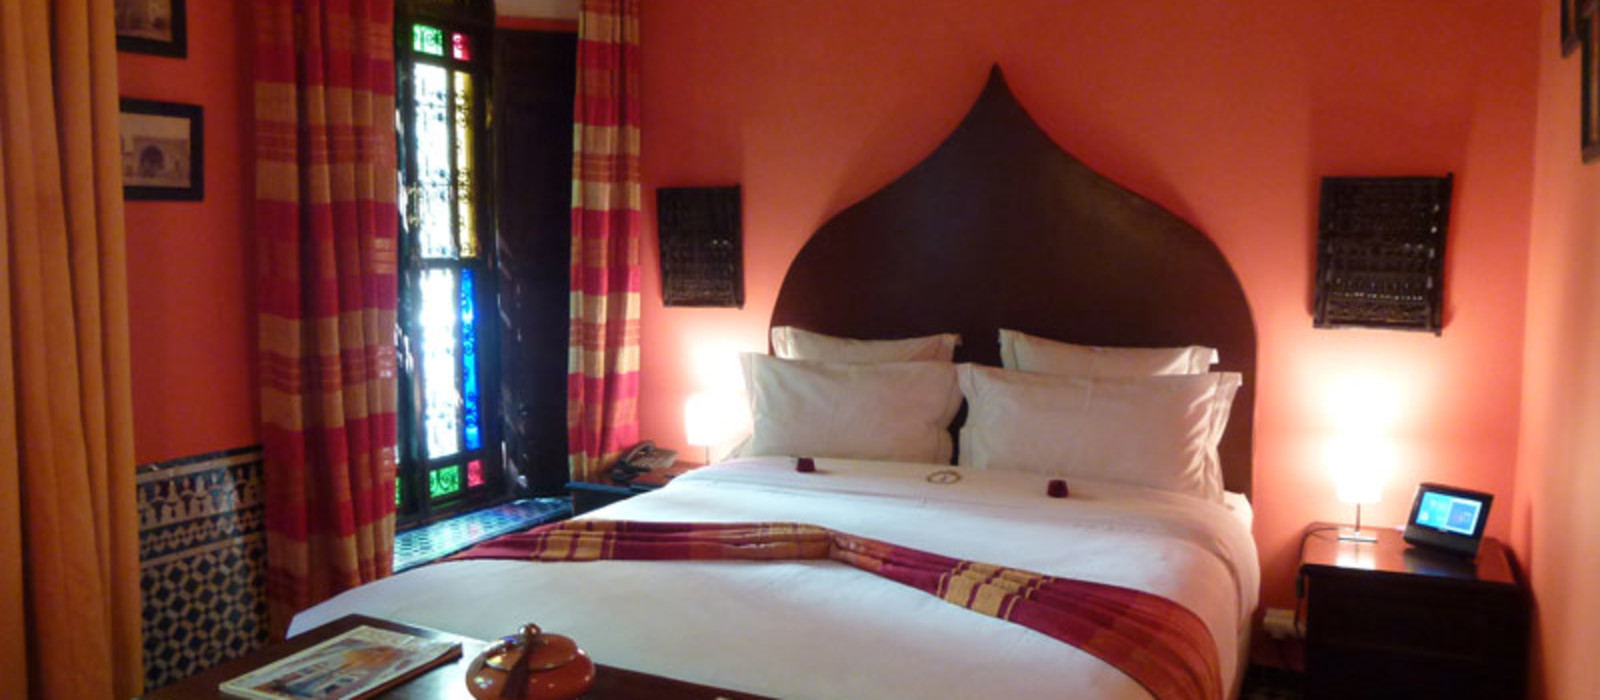 Hotel Riad Le Calife Morocco